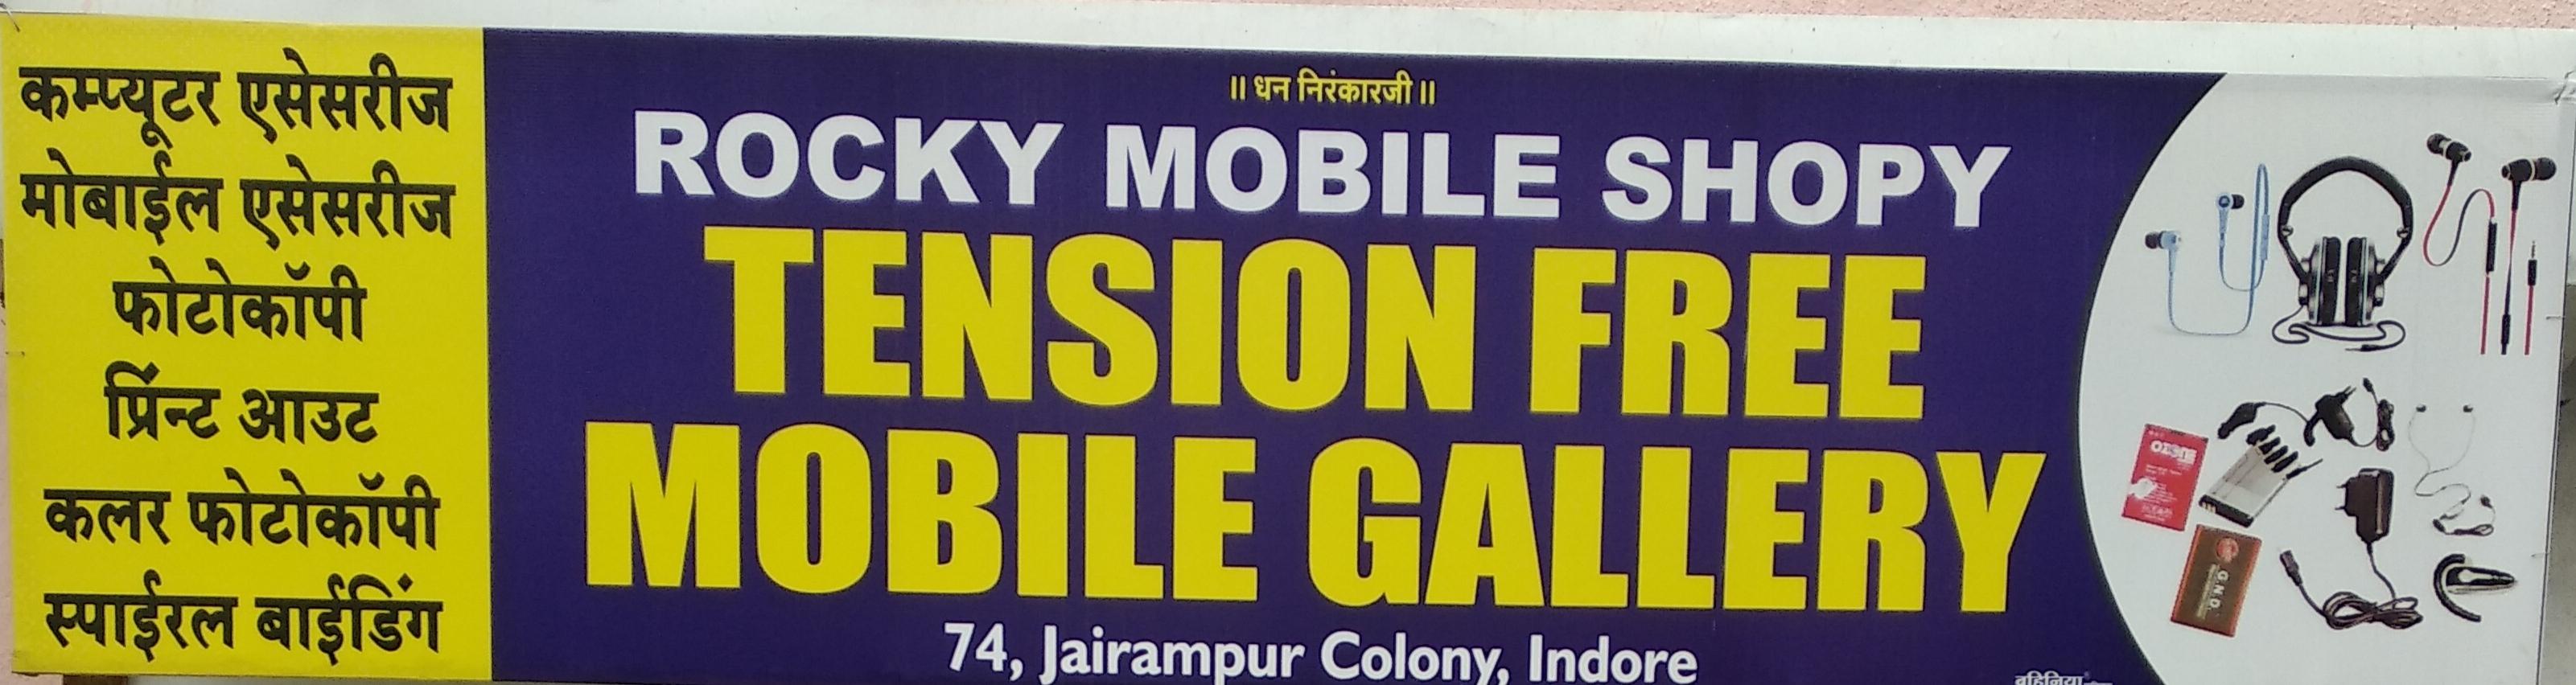 rocky mobile shopy